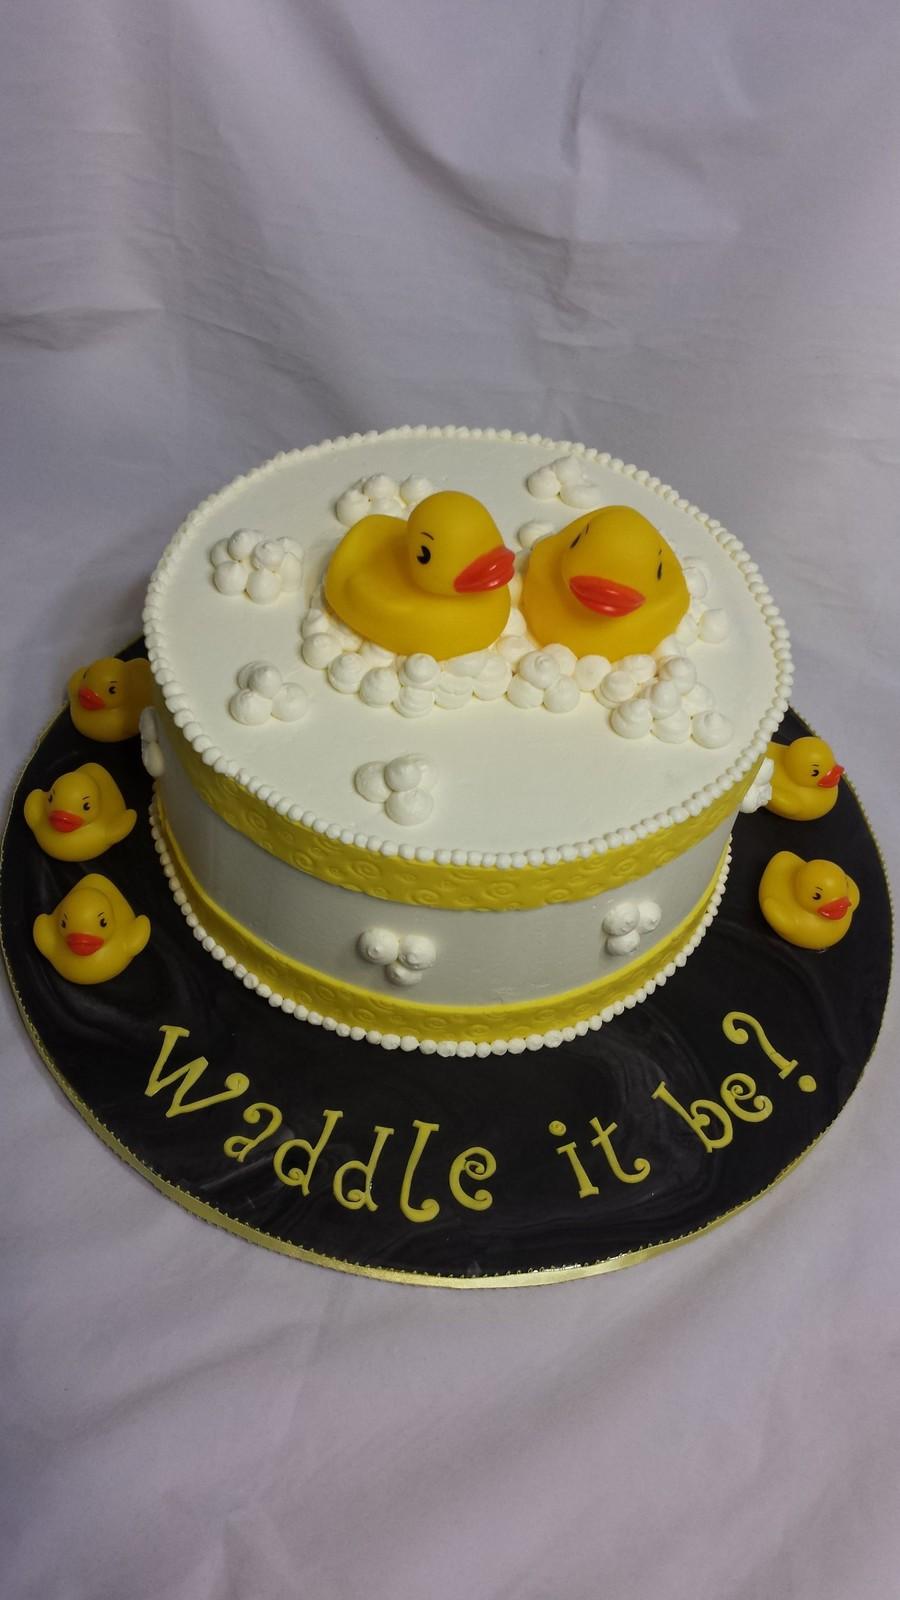 [Image: 900_746449kQcU_waddle-it-be-a-gender-reveal-cake.jpg]